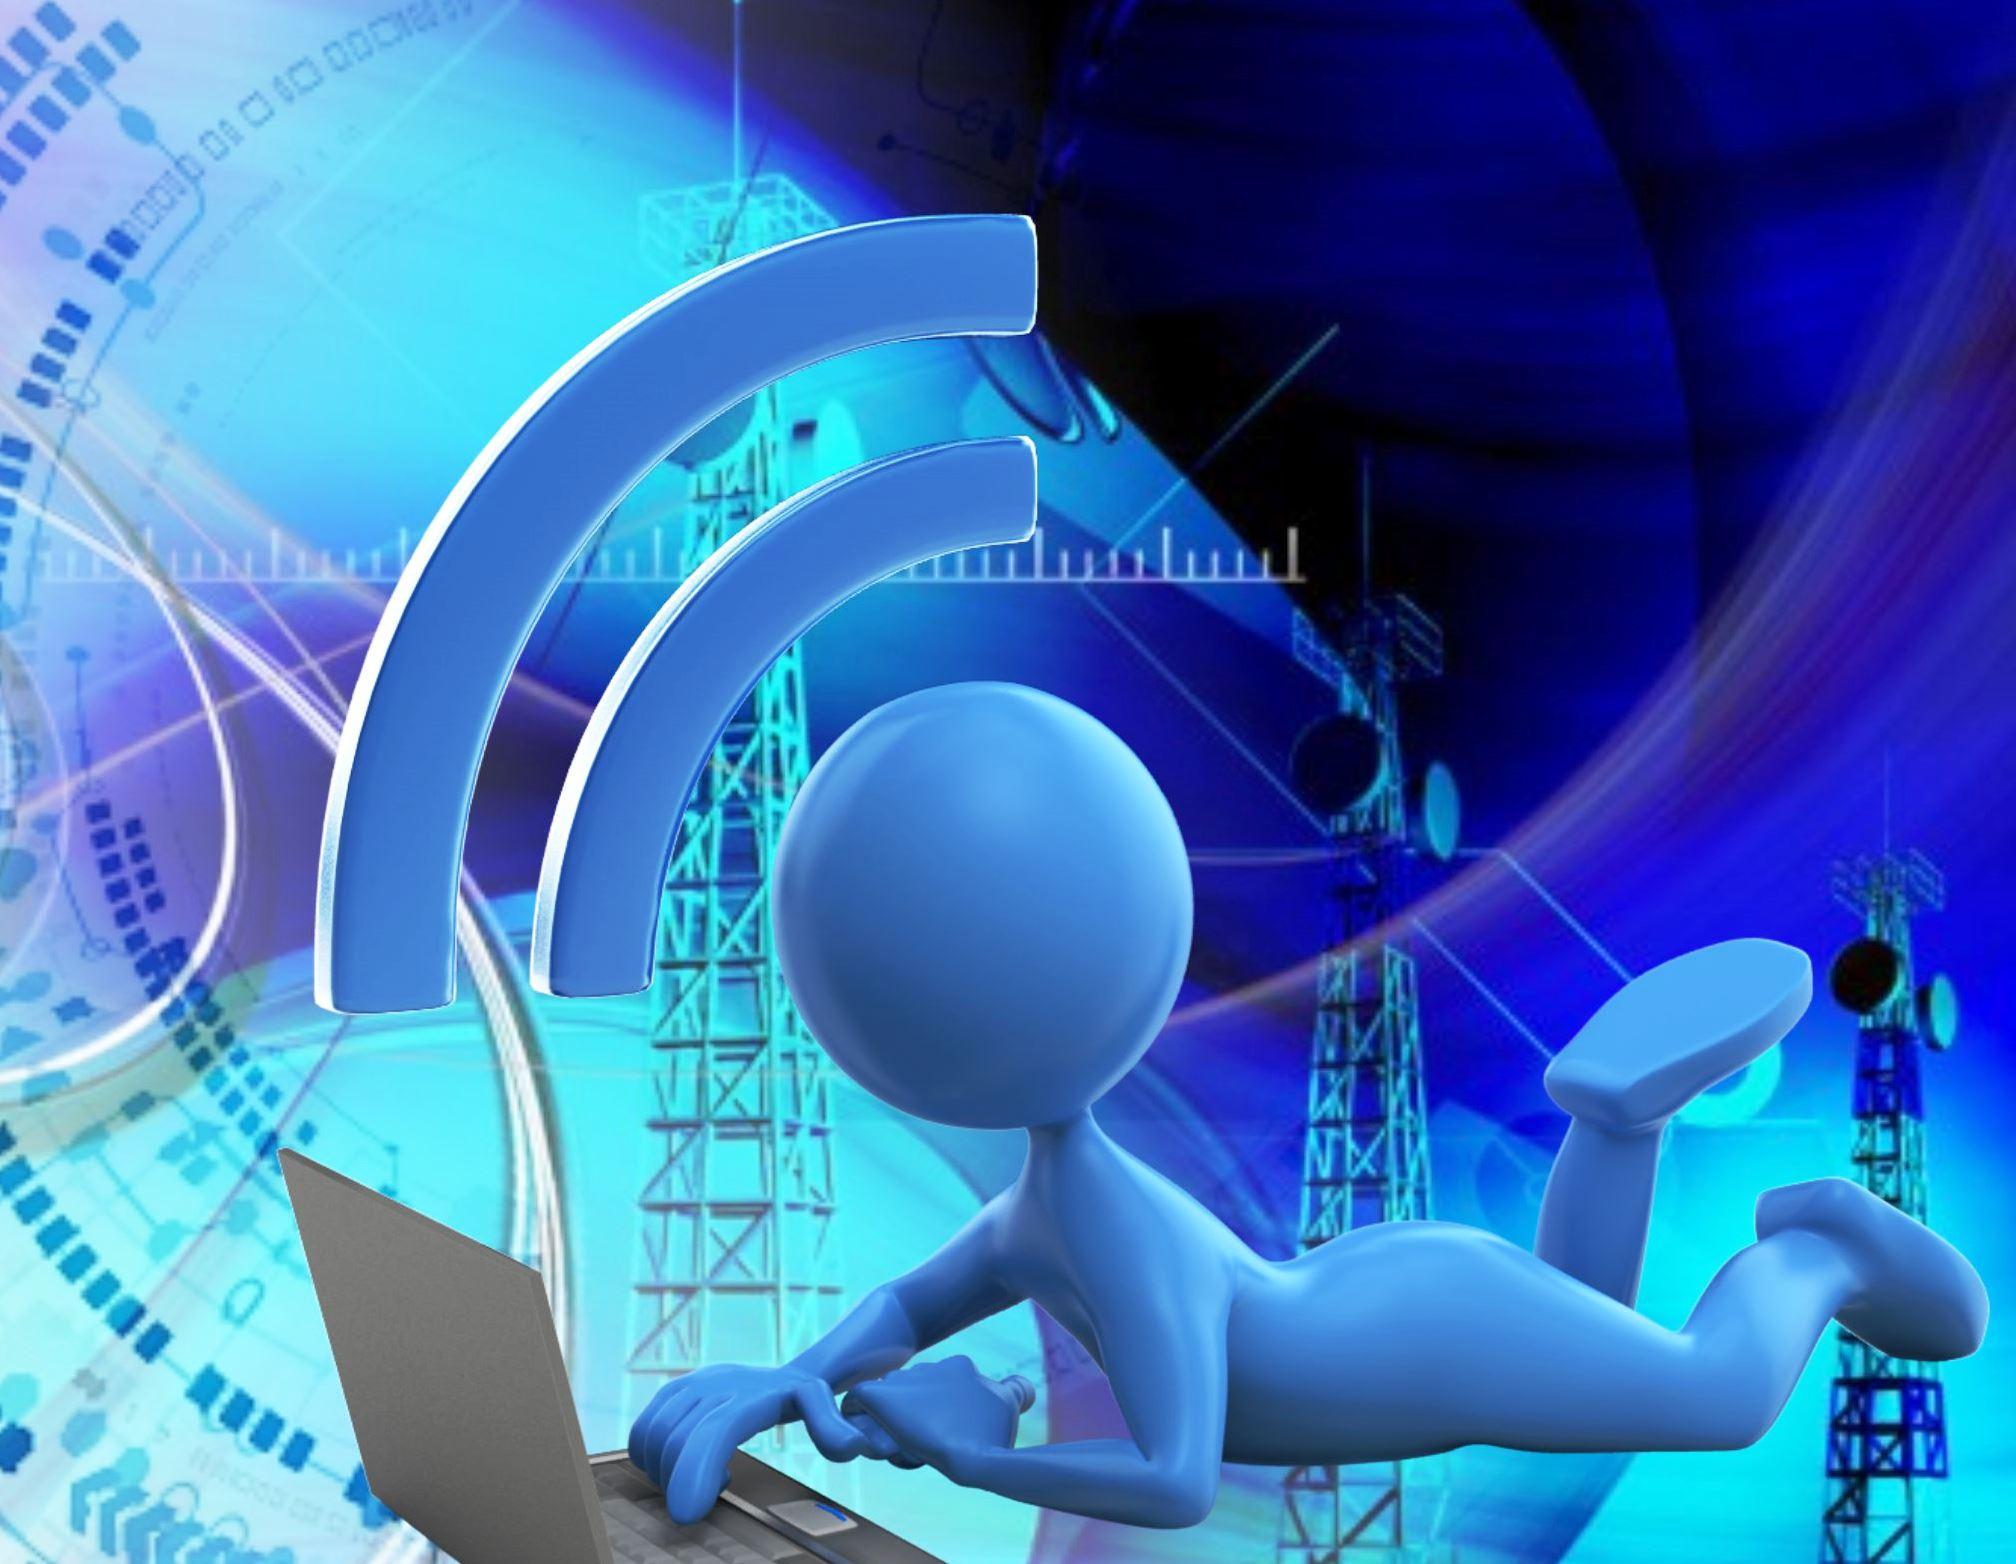 Mengenal Teknologi Wireless untuk Akses Internet Cepat